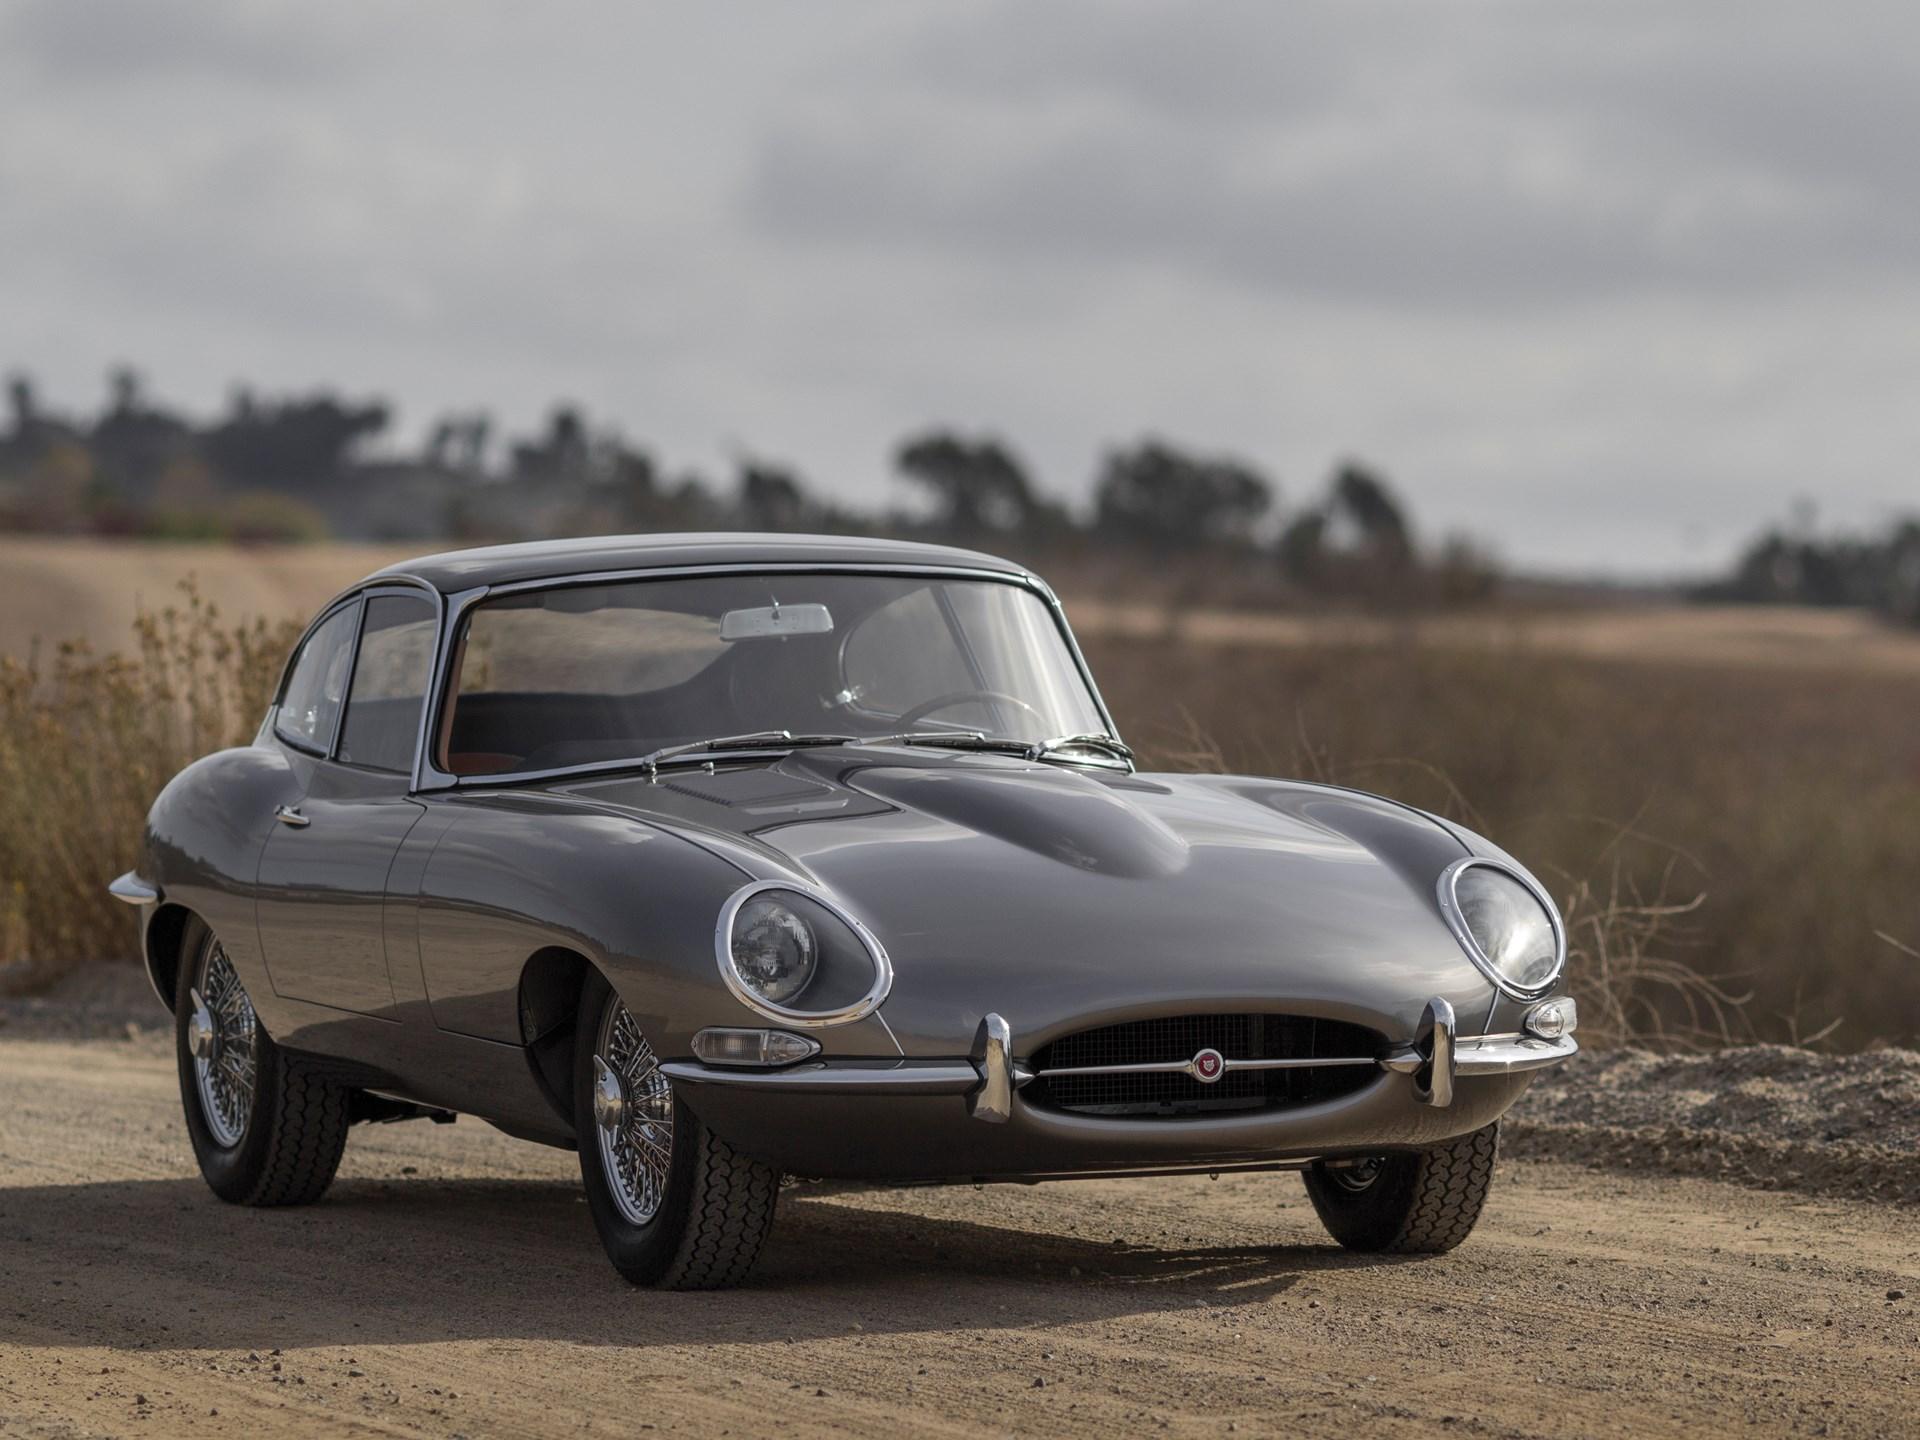 1964 Jaguar E Type Series 1 3.8 Litre Fixed Head Coupe